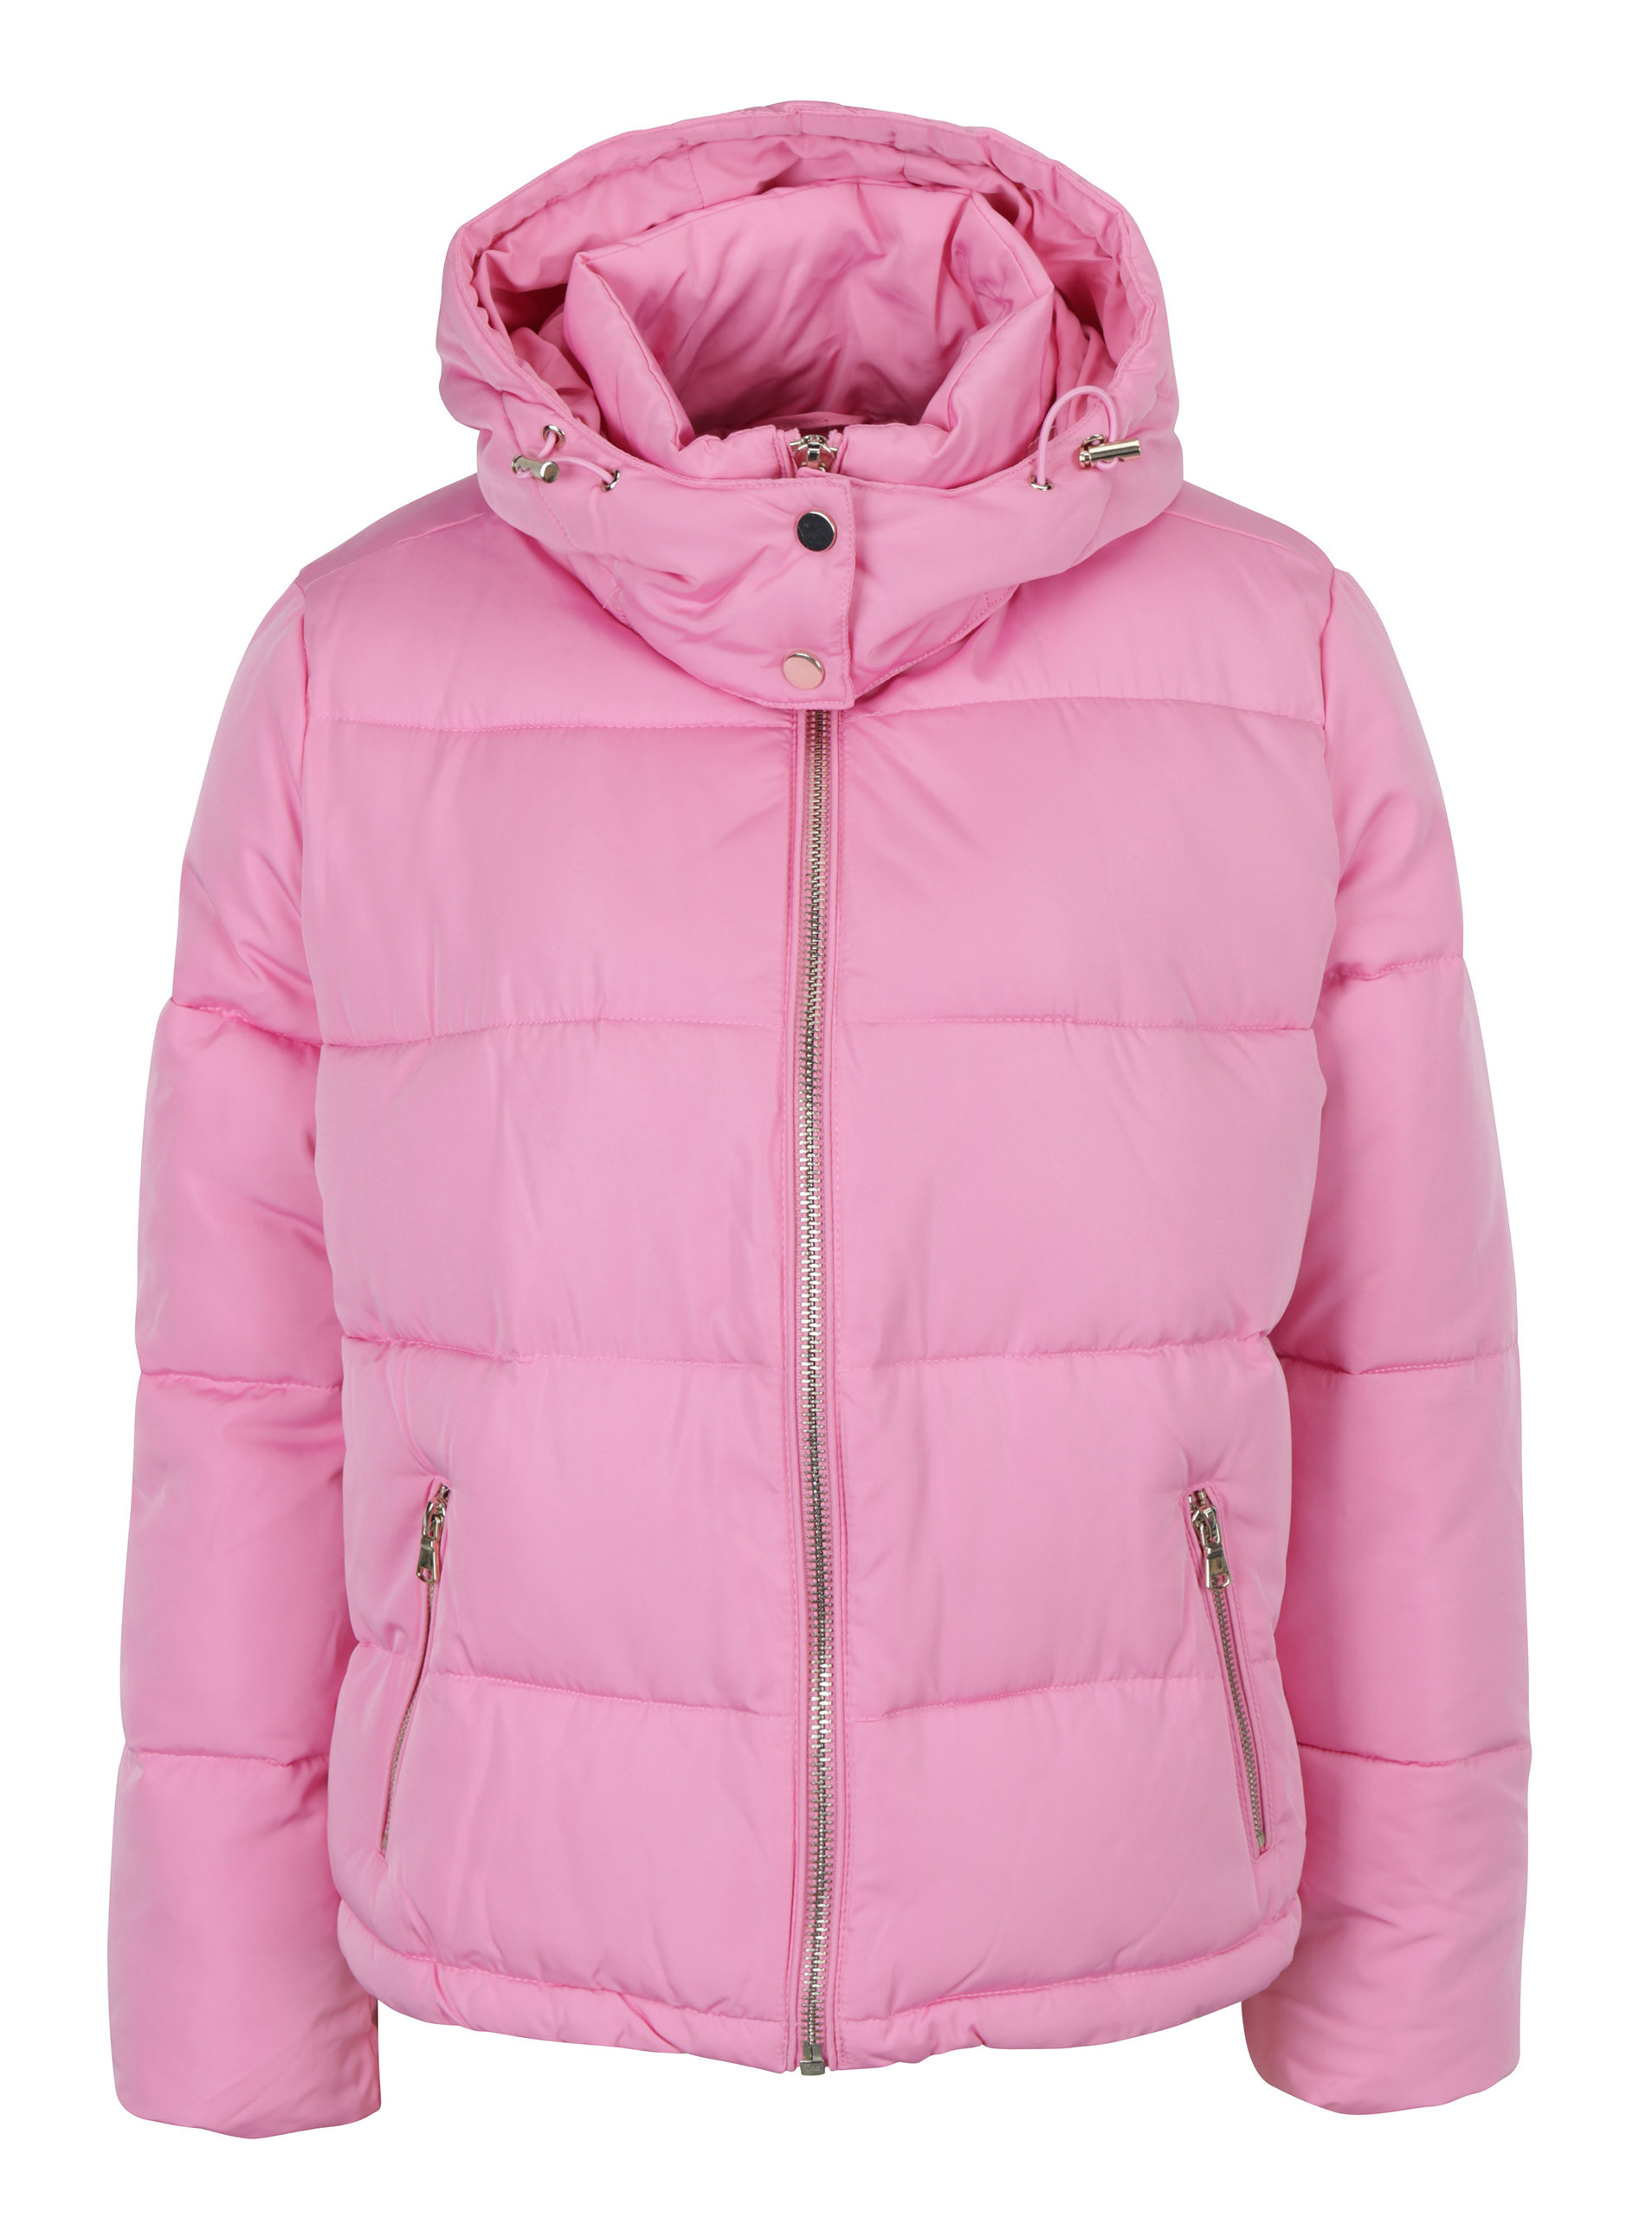 Ružová prešívaná bunda s kapucňou Miss Selfridge ... 76d726251a3